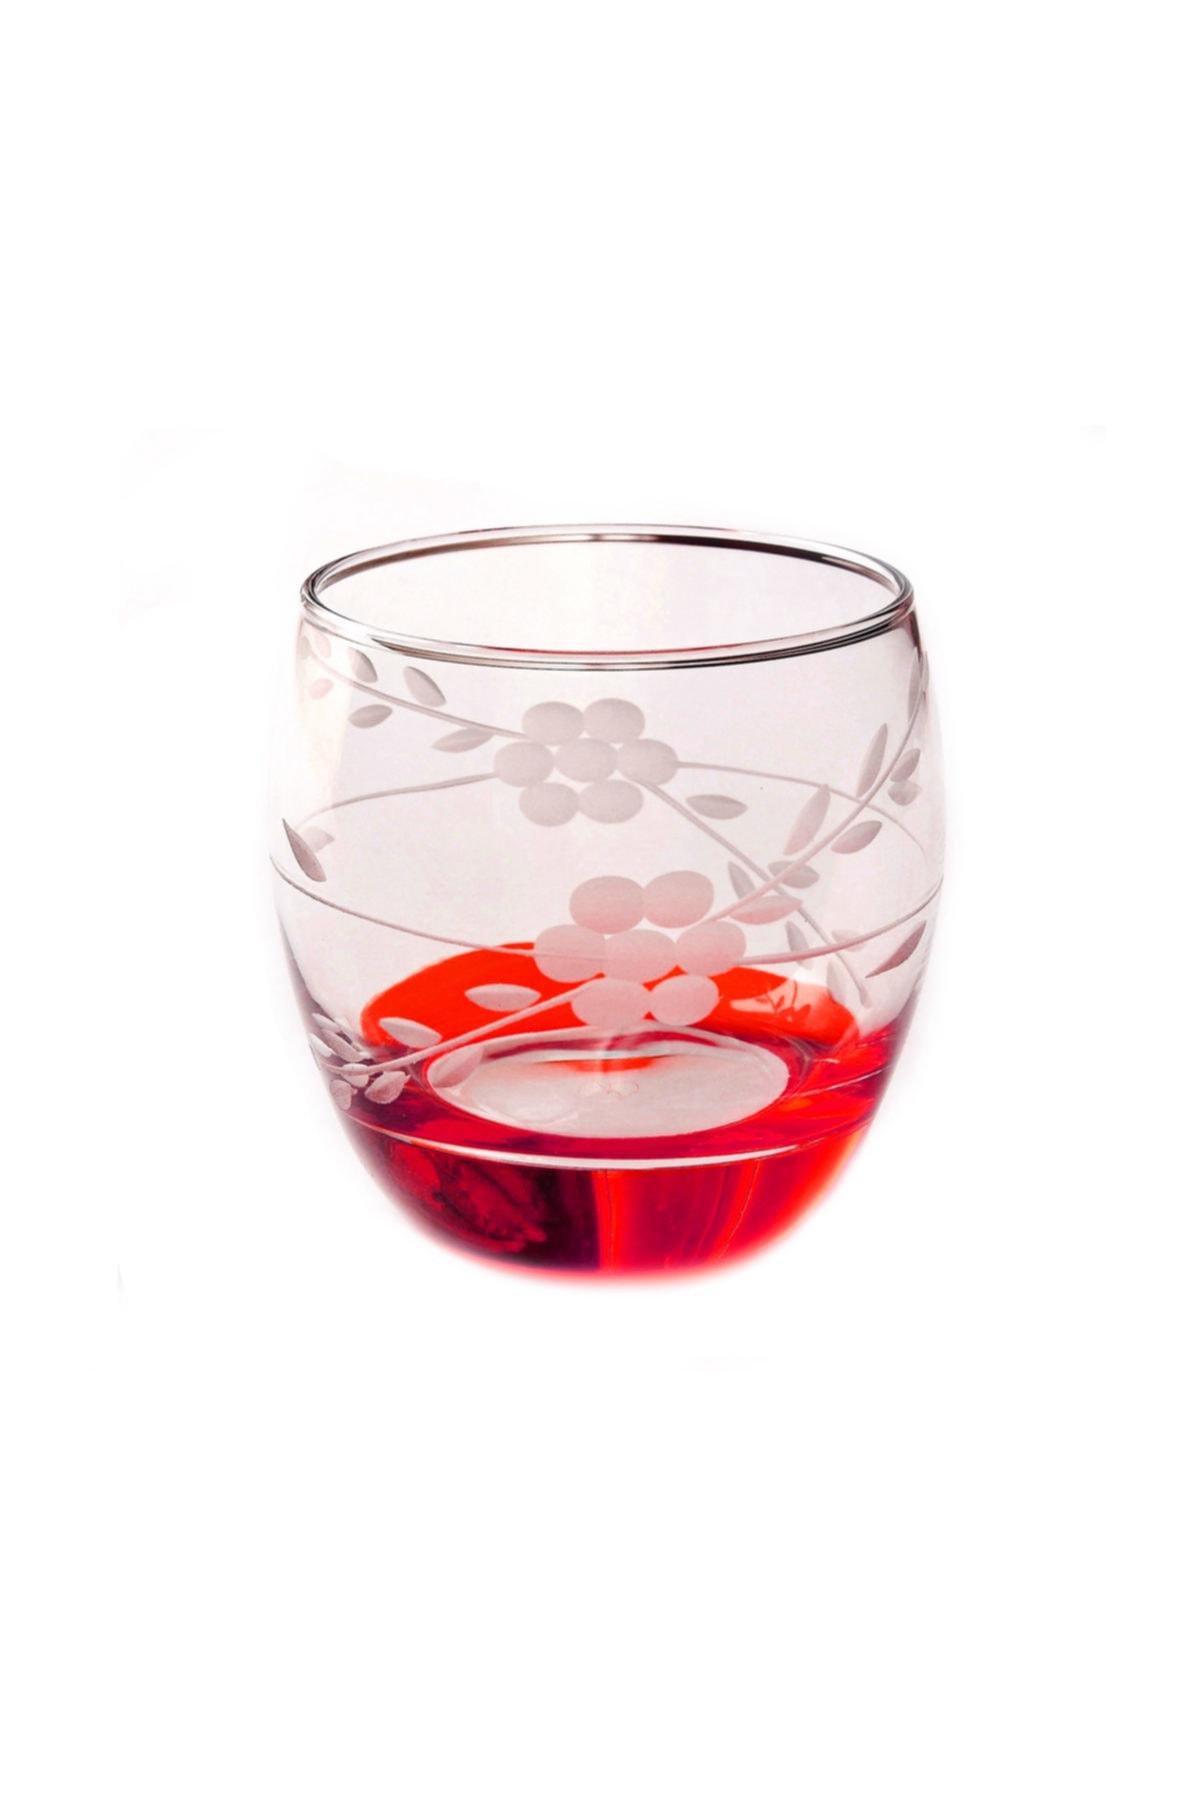 BAŞAK Paşabahçe 41010 Papatya Kırmızı   Barel Su-meşrubat Bardağı 6 Adet 1